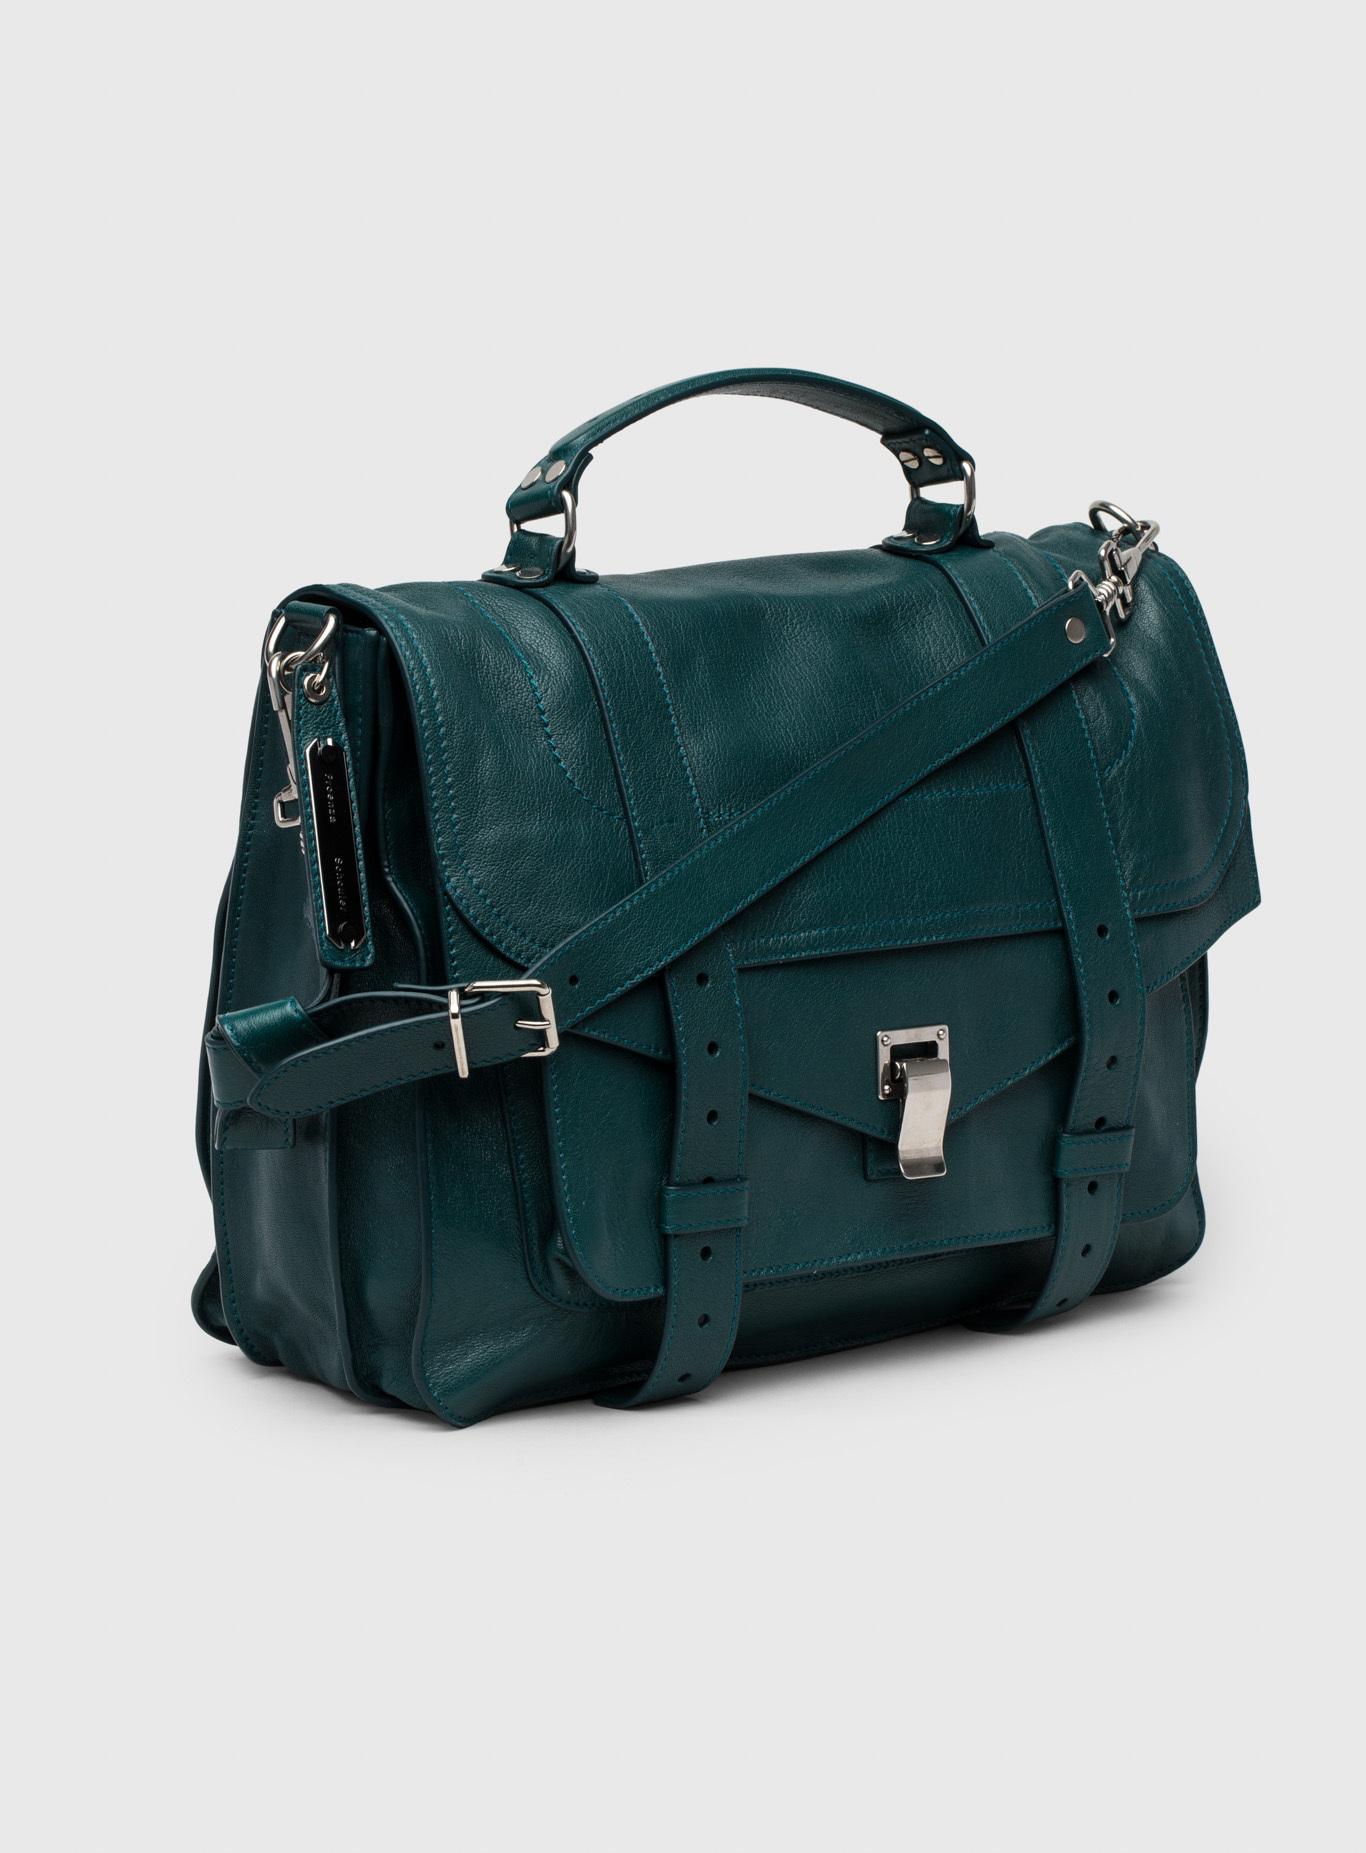 chloe replica handbags uk - chloe calfskin large marcie satchel ebony